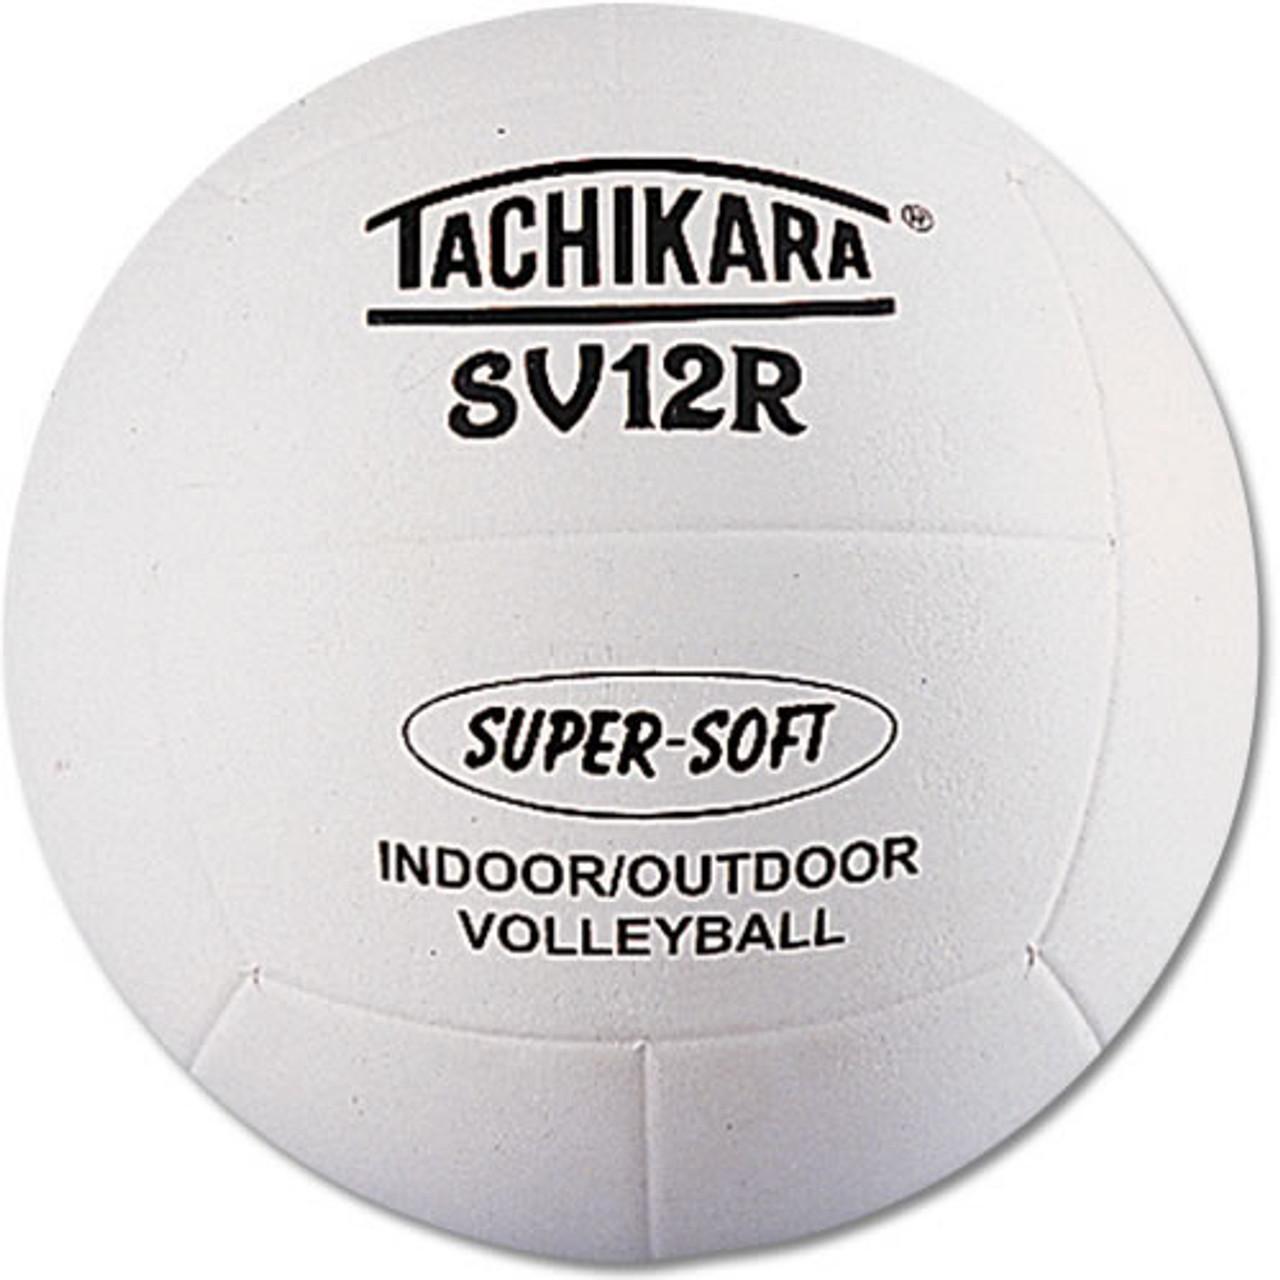 Tachikara ''Super-Soft'' Volleyball